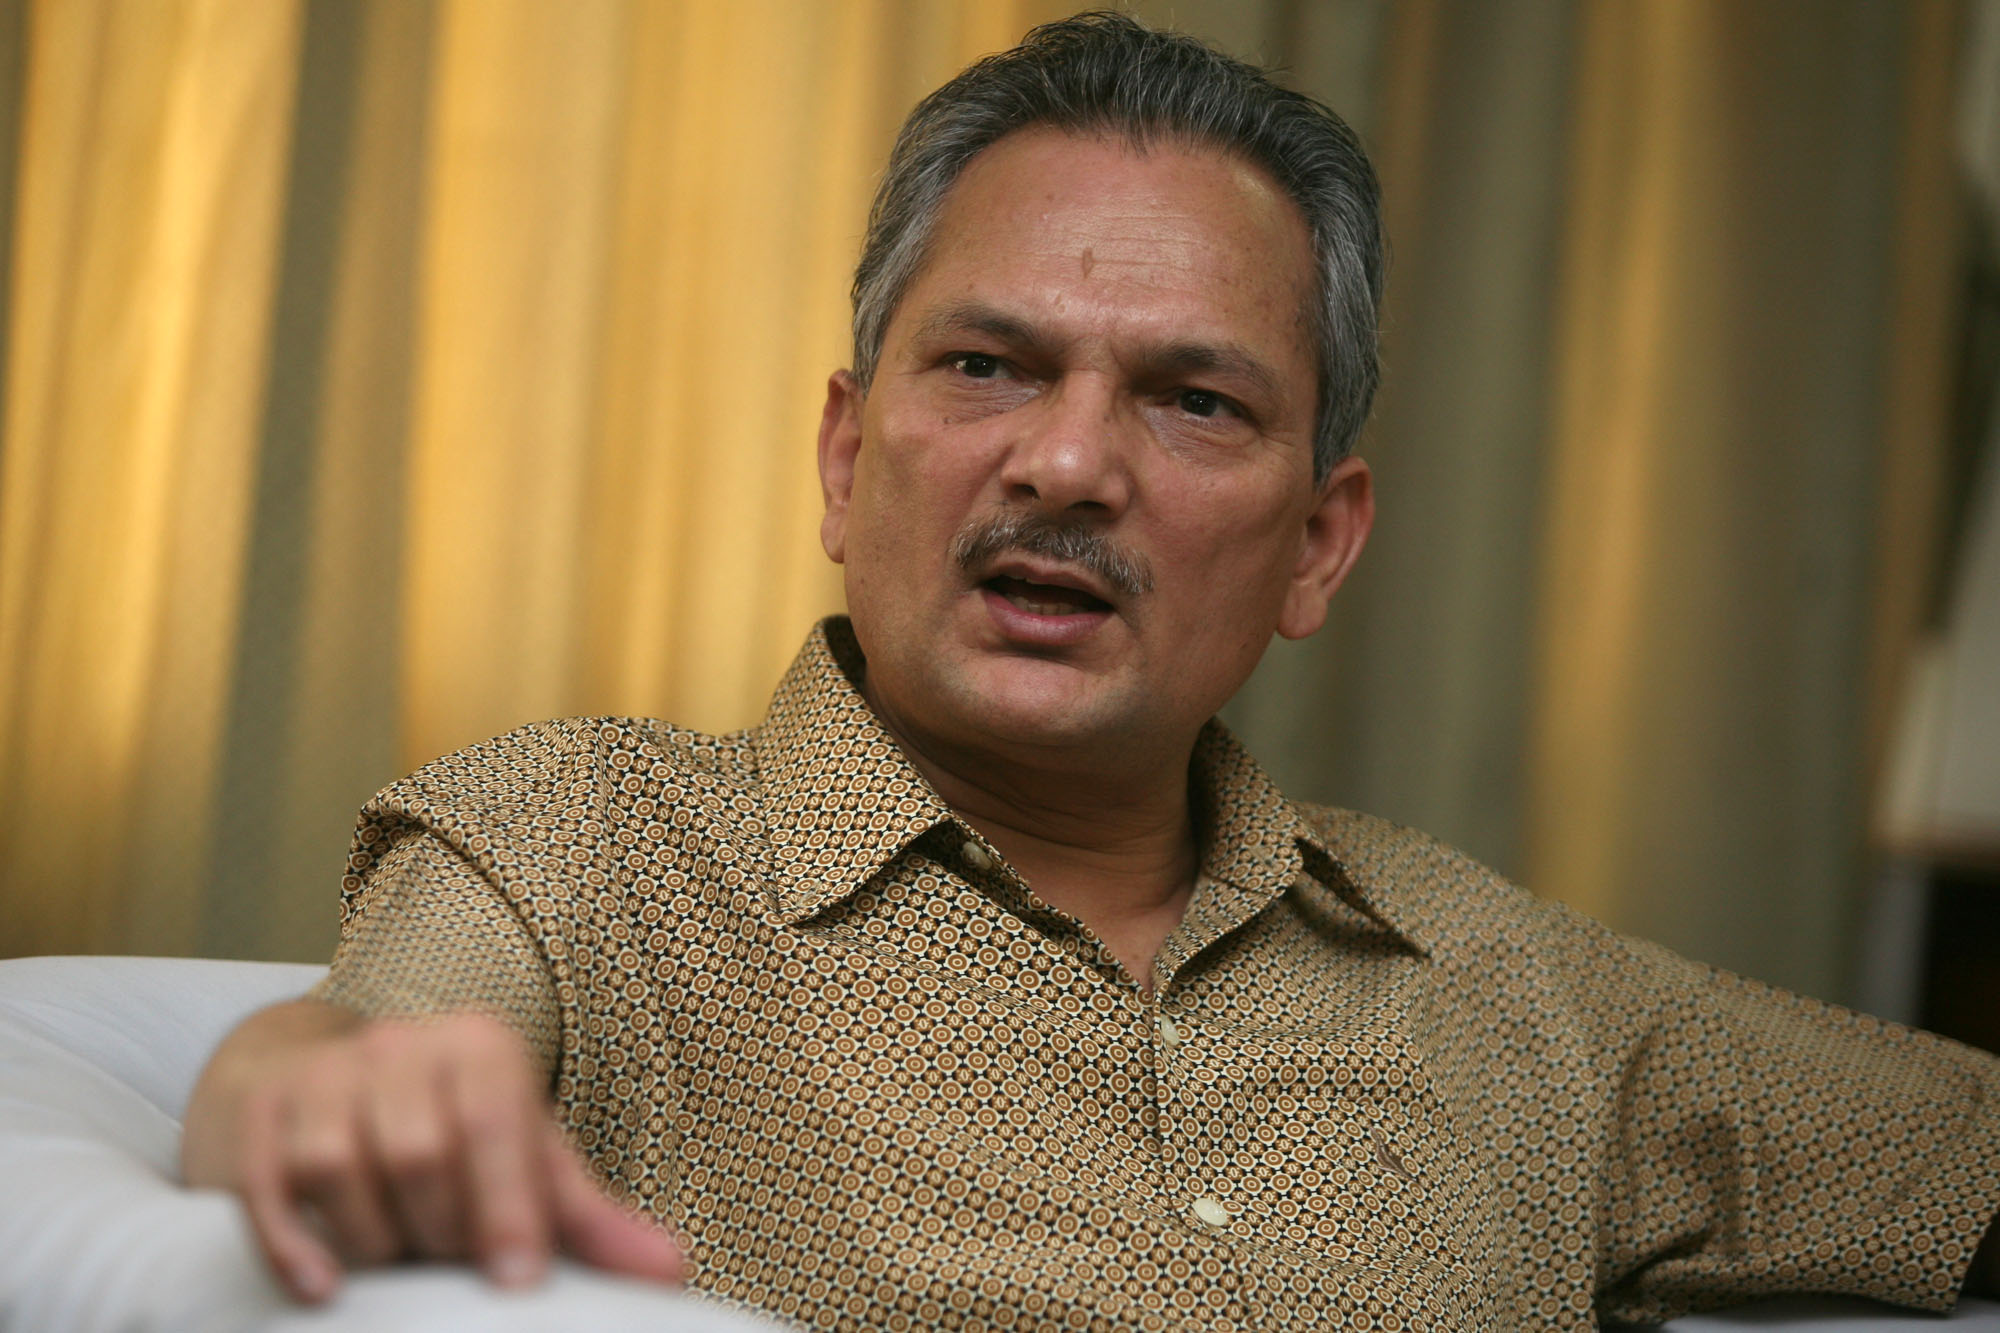 People's representatives are people's servants: Dr Bhattarai